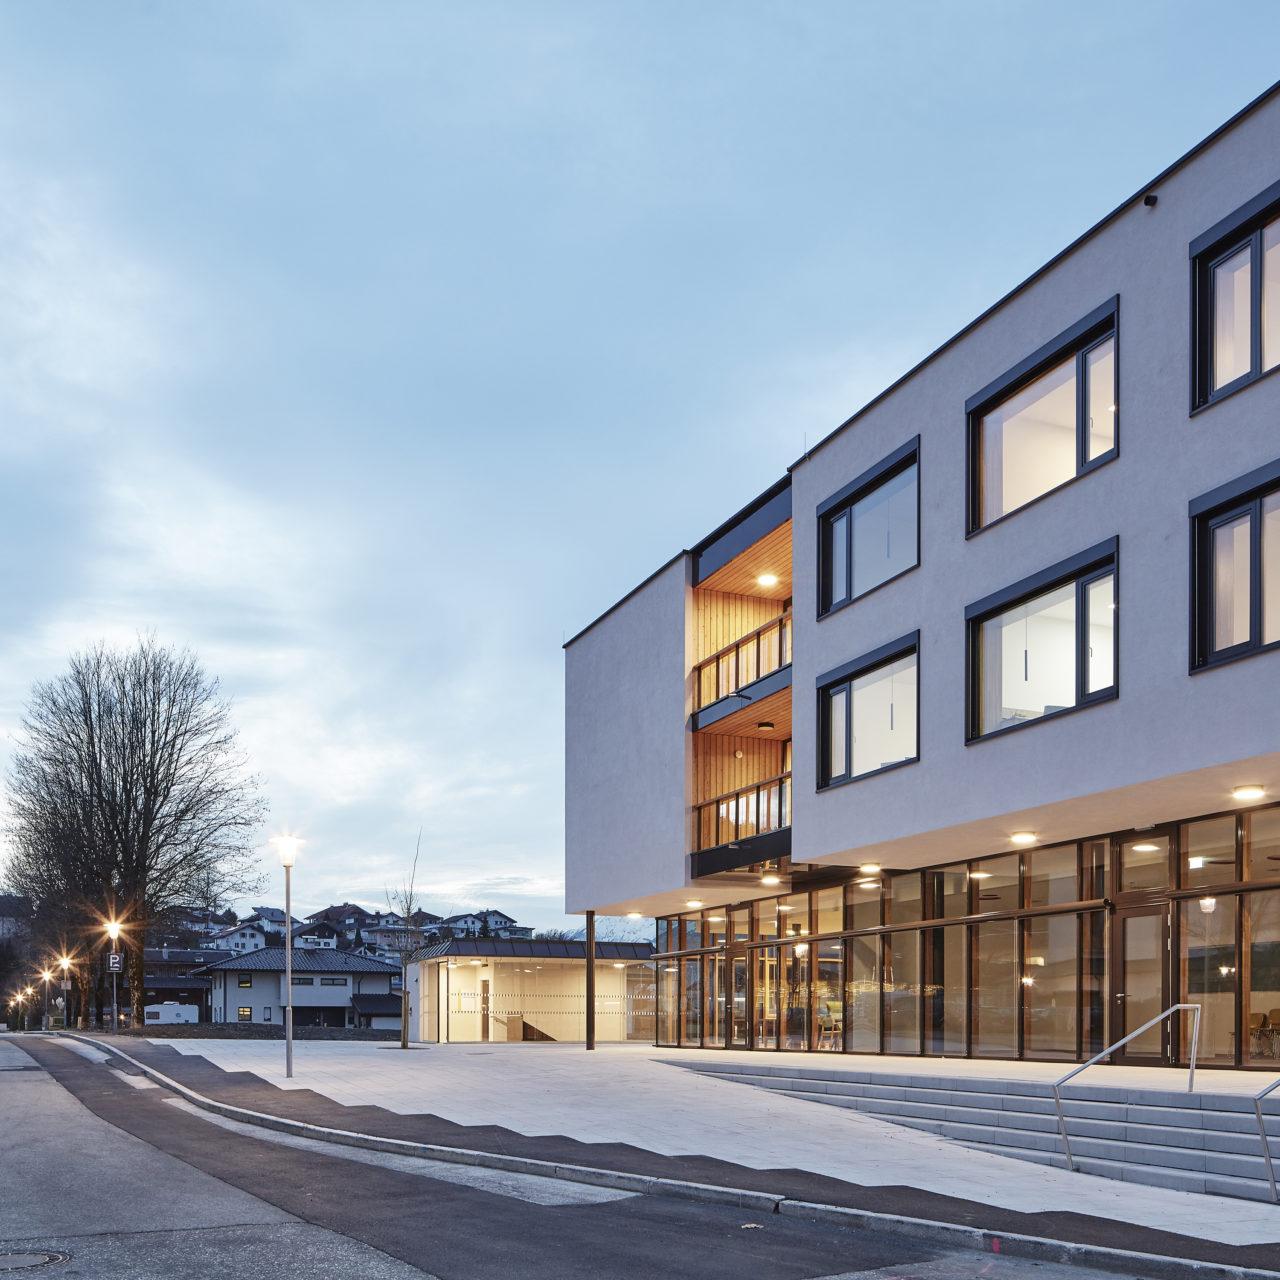 Haus am Kirchfeld Abends Foto David Schreyer